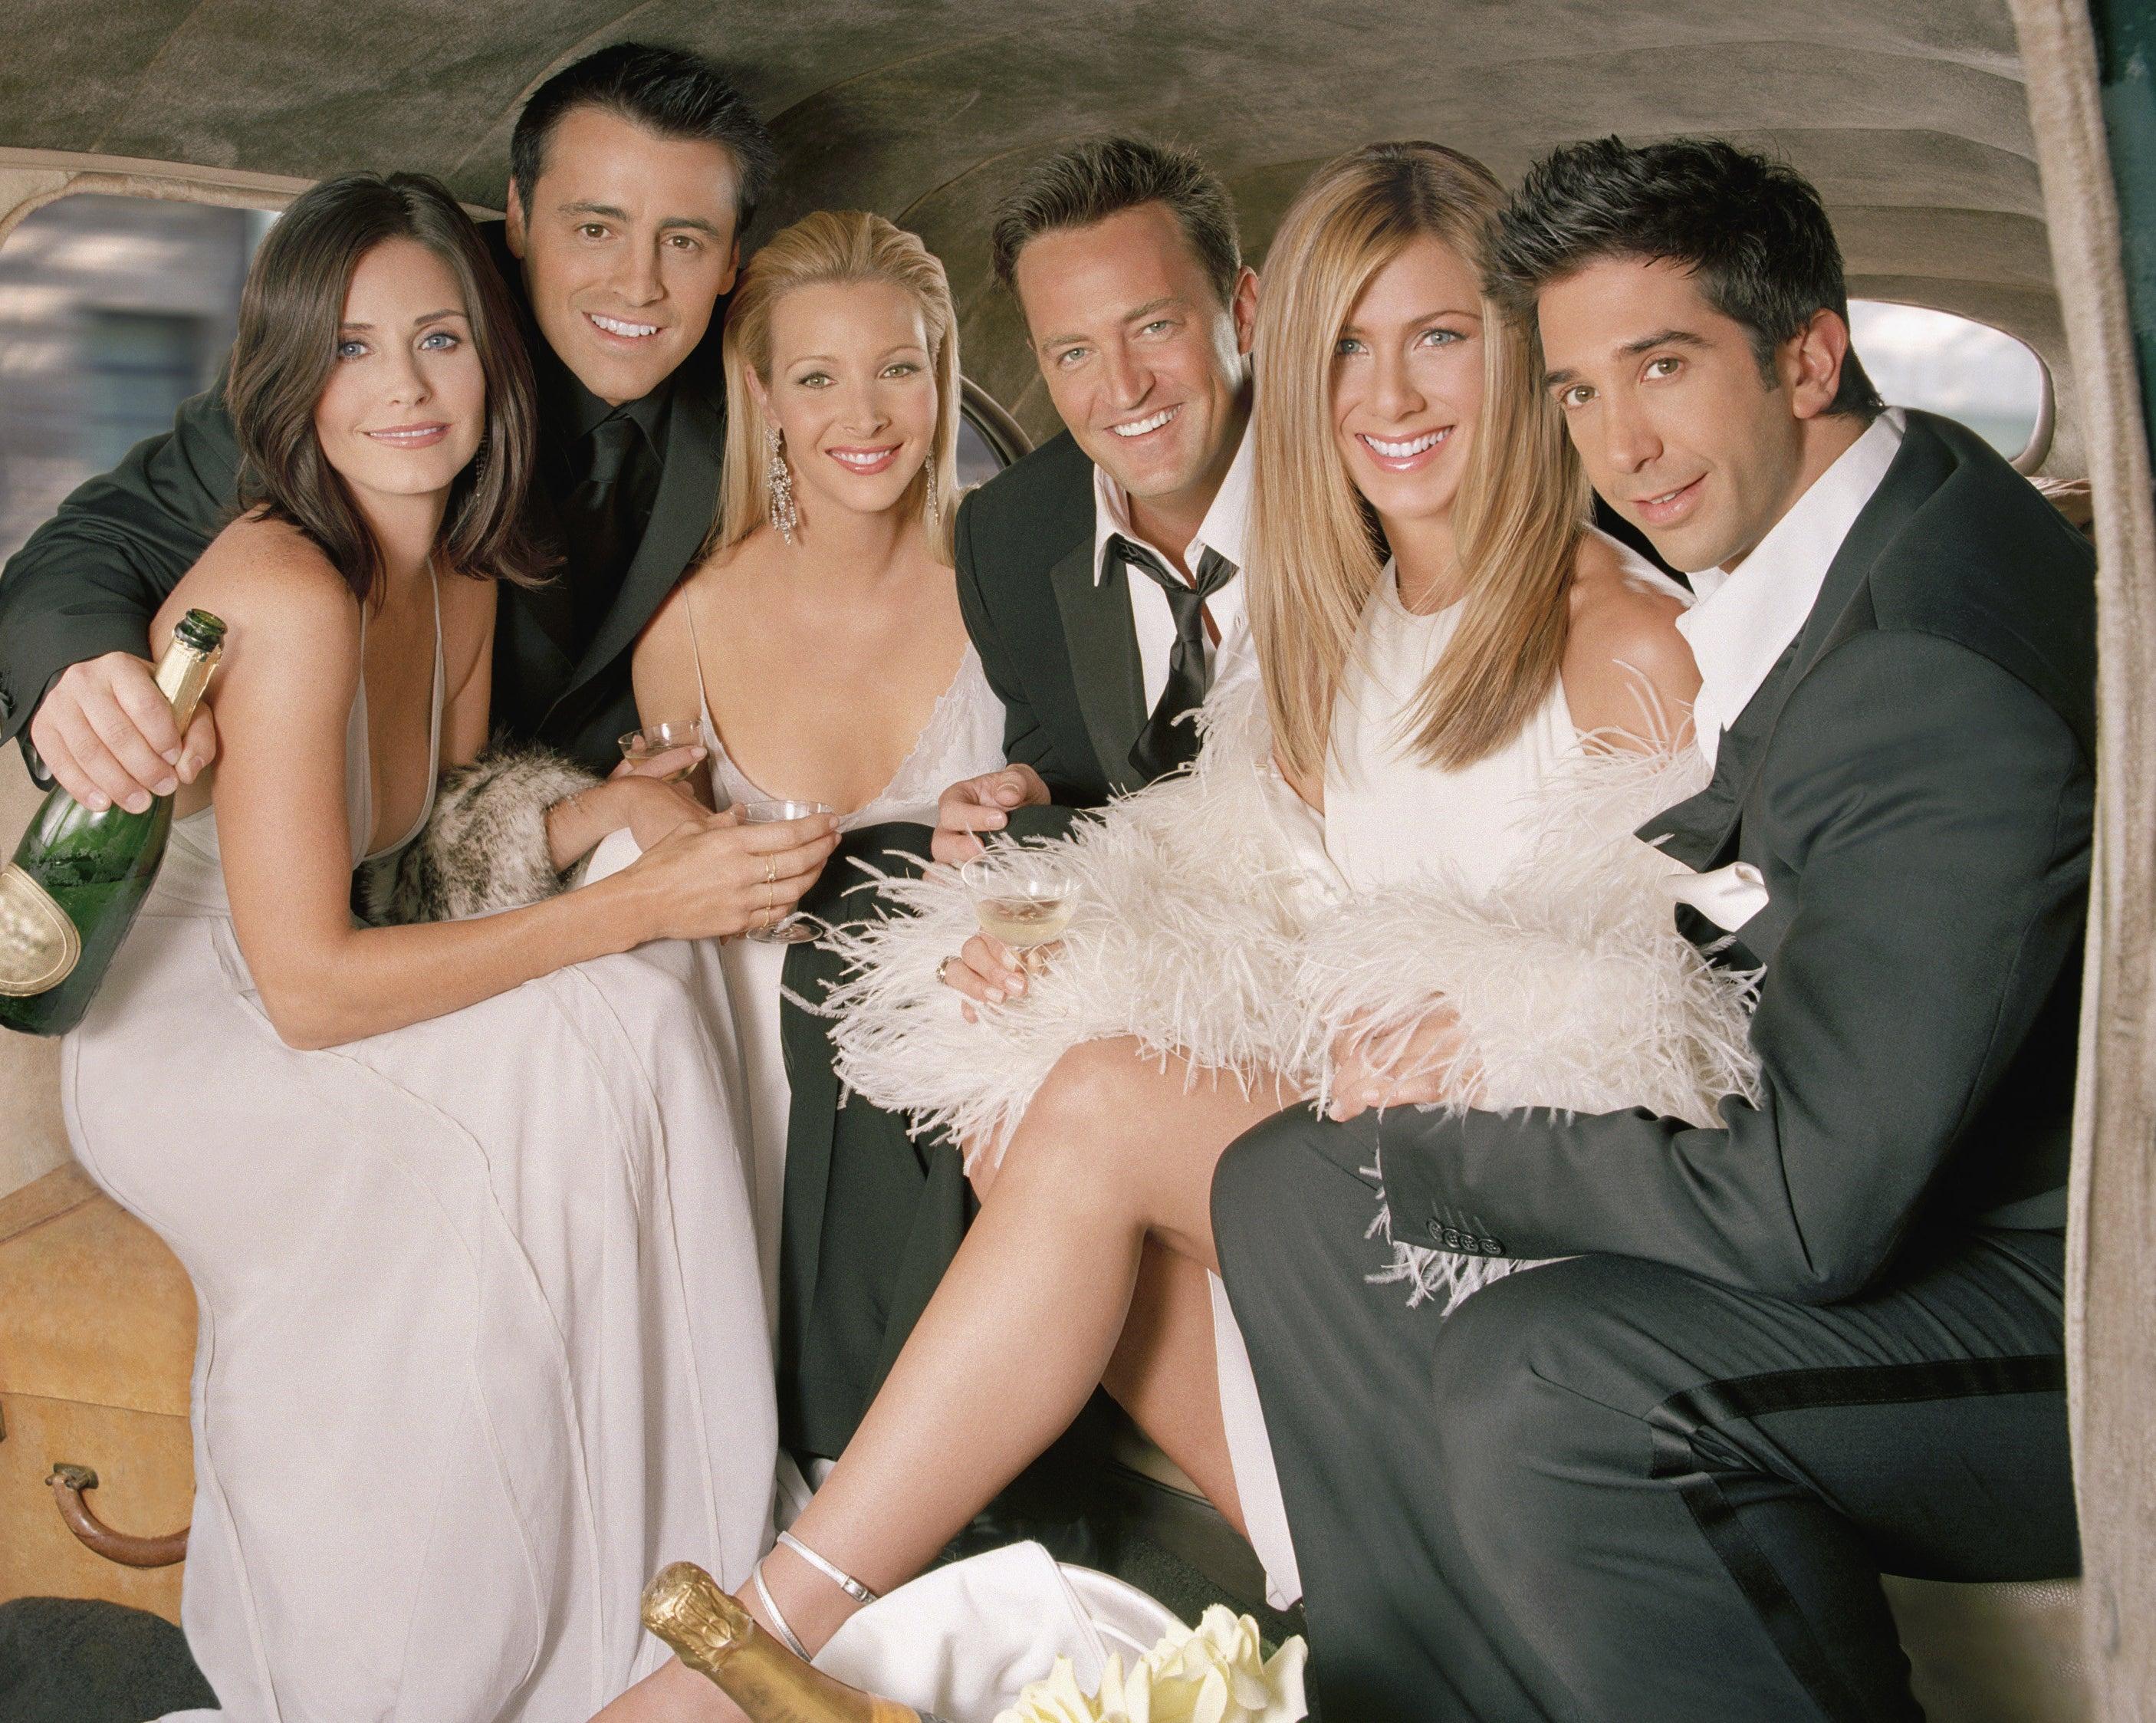 The Friends cast sit in a limo in formal wear